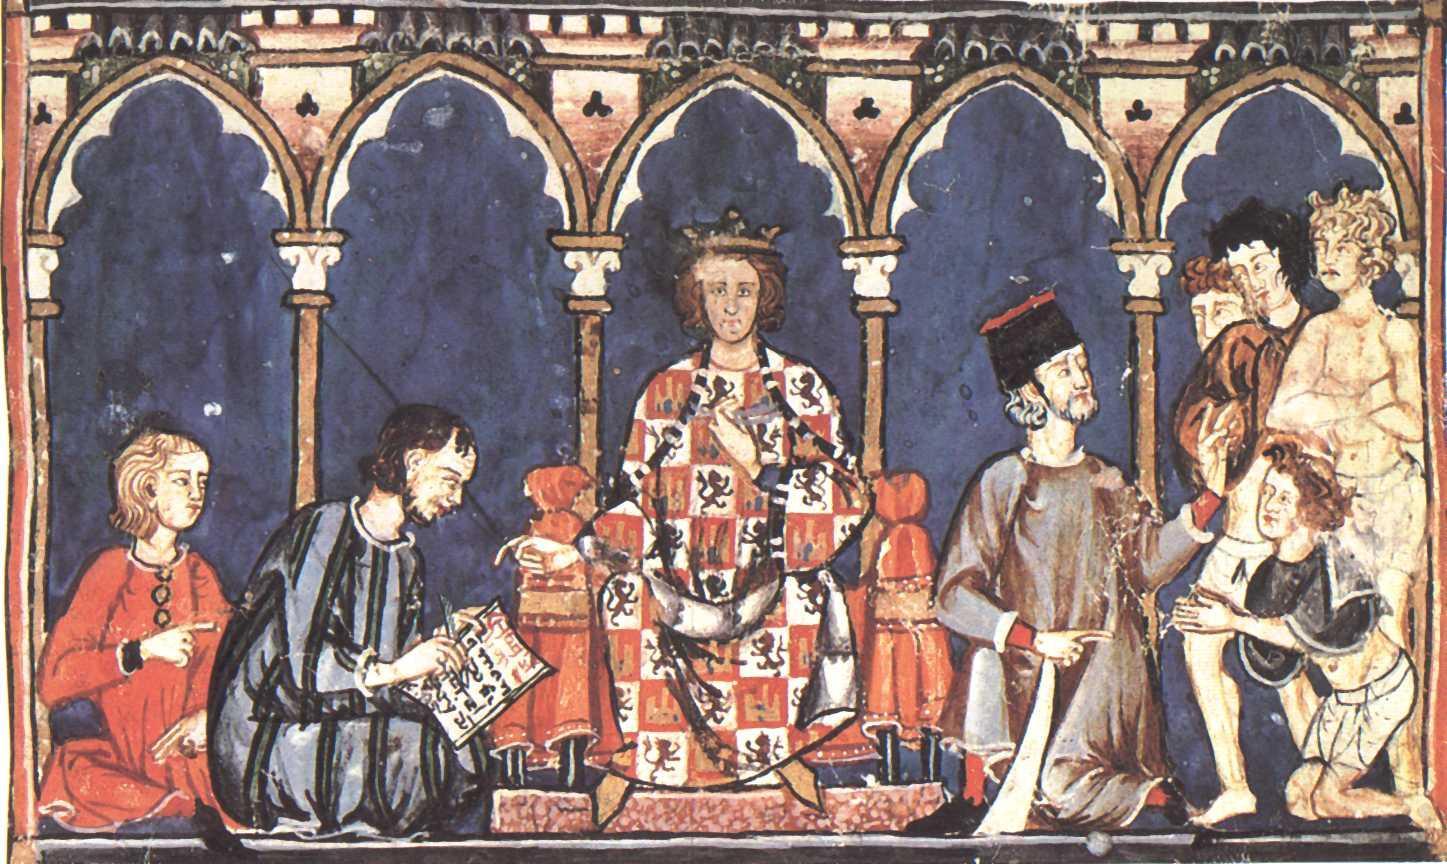 /Users/lambertn/Desktop/X/Alfonso X as a judge, from his Libro de los dados, completed ca. 1280.jpg